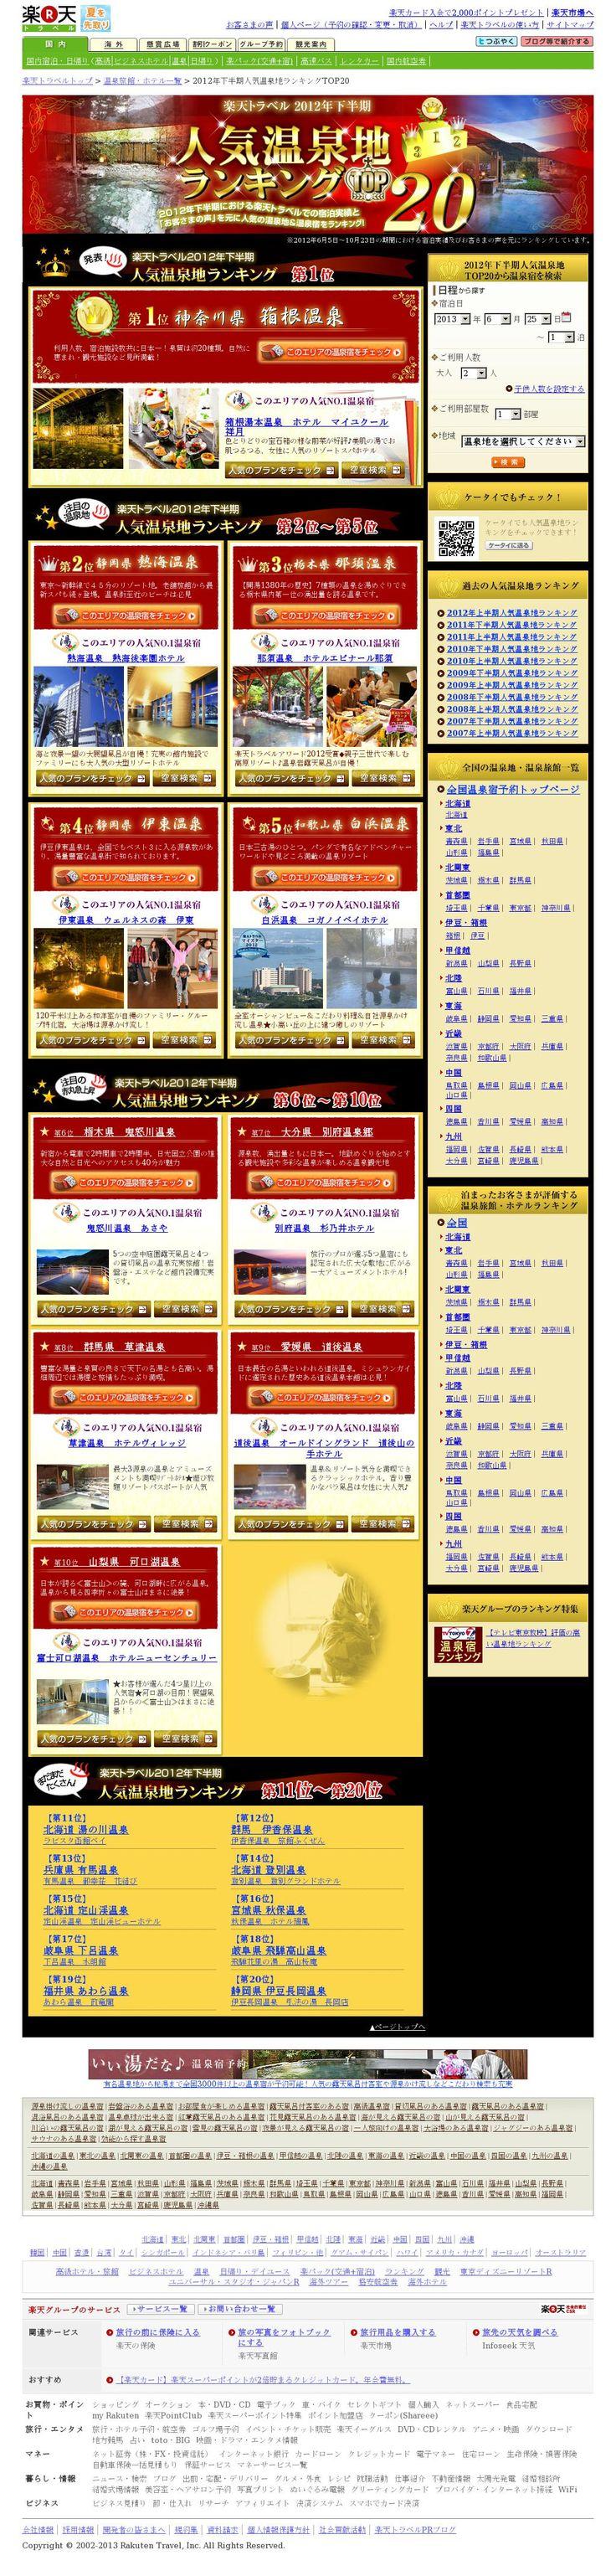 【D】【常設】2013上半期人気温泉地ランキング<2013/06/25>